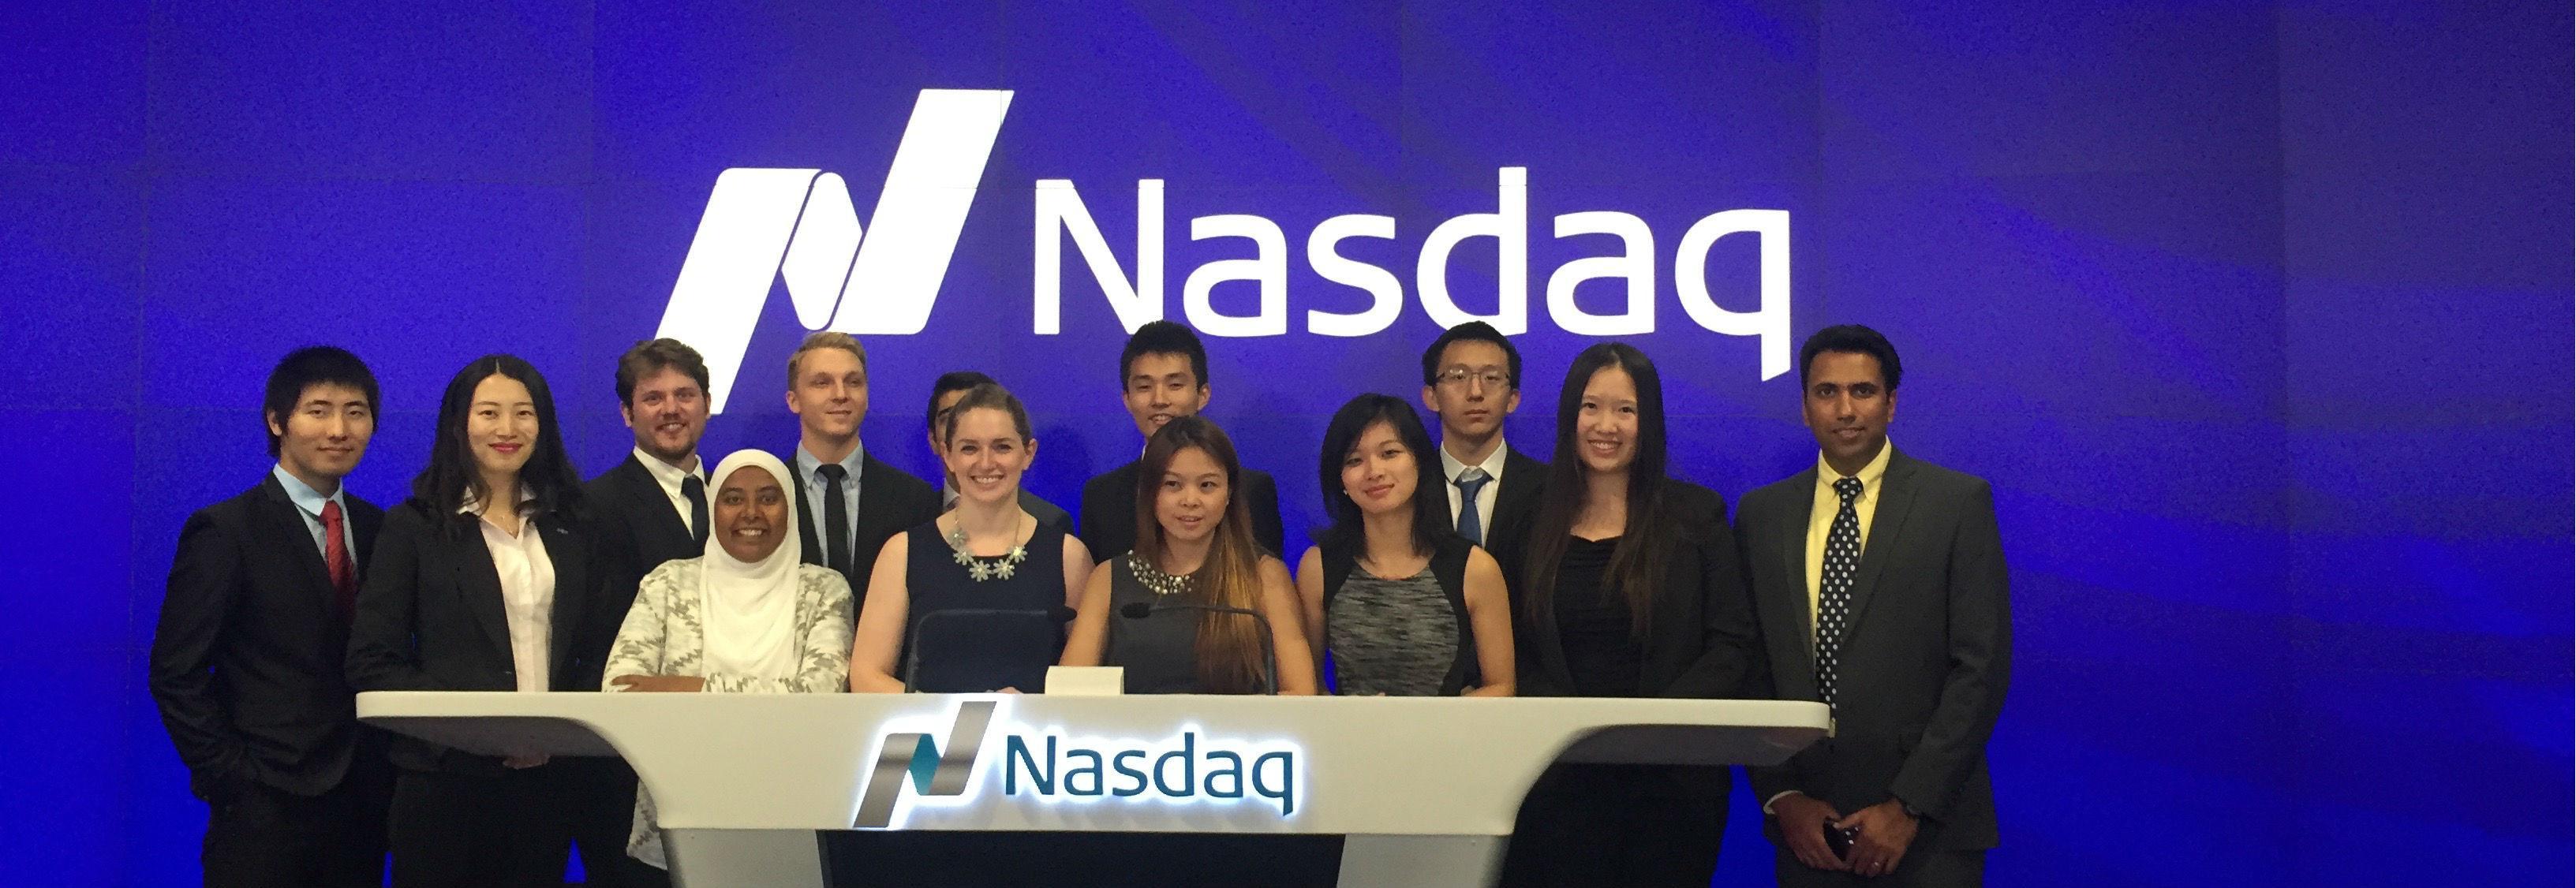 MBA Students Take Their Annual Trip to NASDAQ